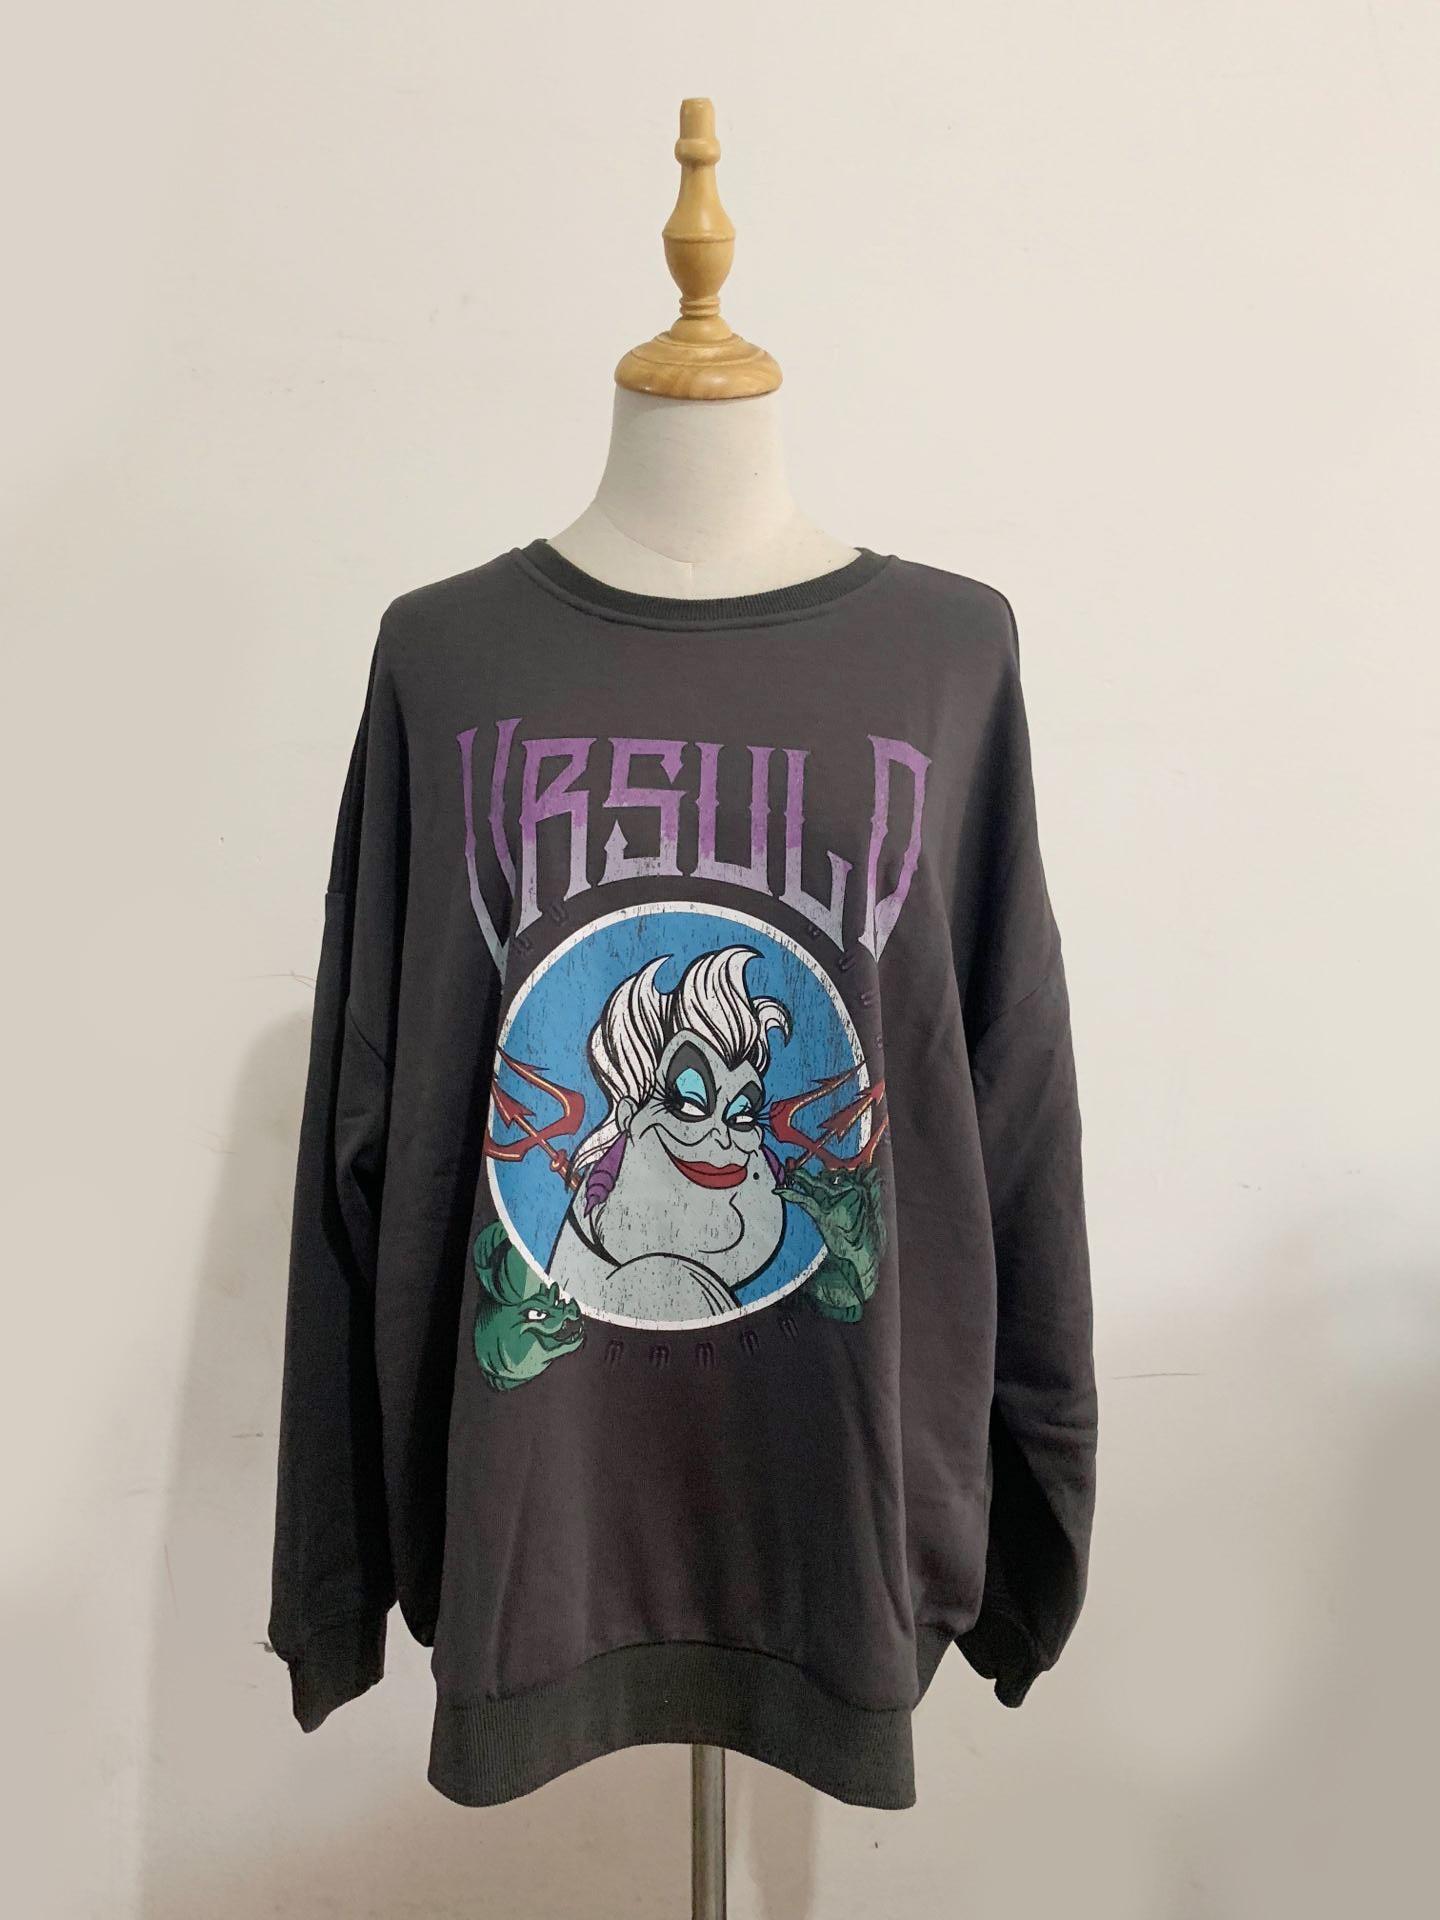 Disney sweatshirt moda a pequena sereia ursula